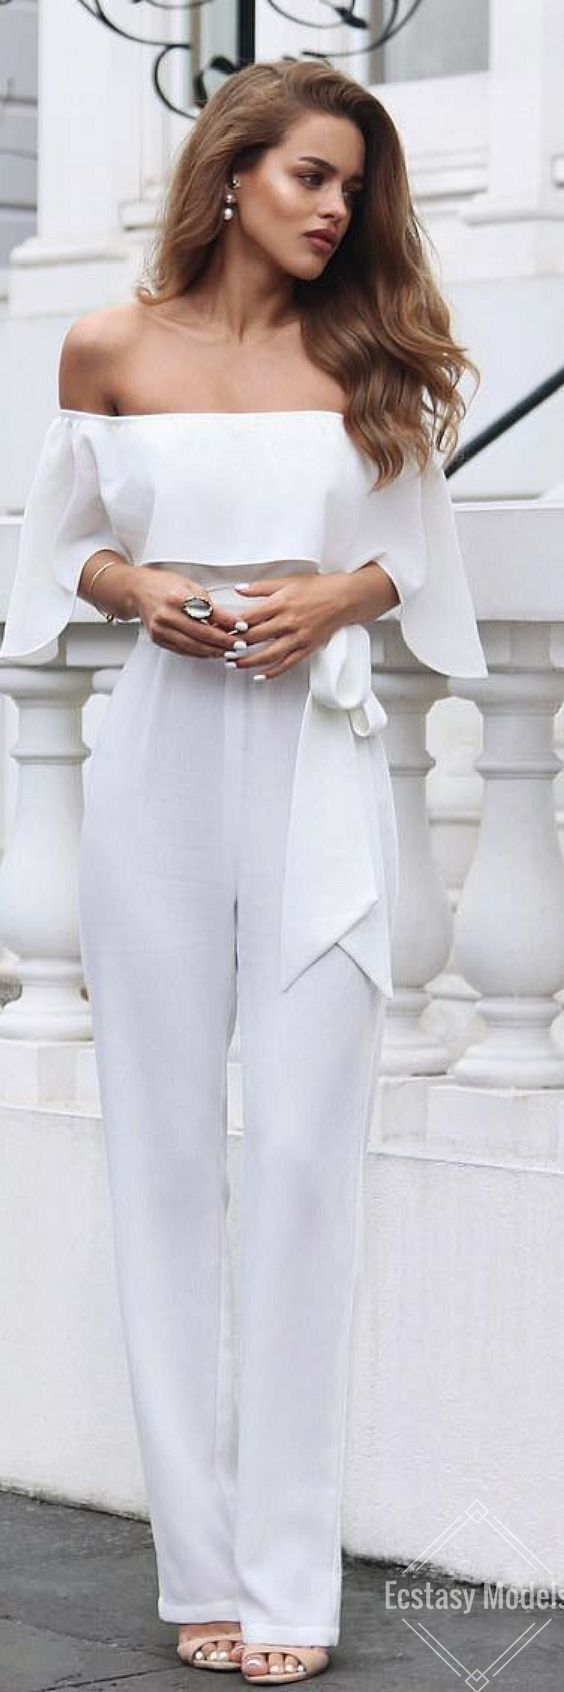 142 best Elbise~ images on Pinterest | Abendkleider ...